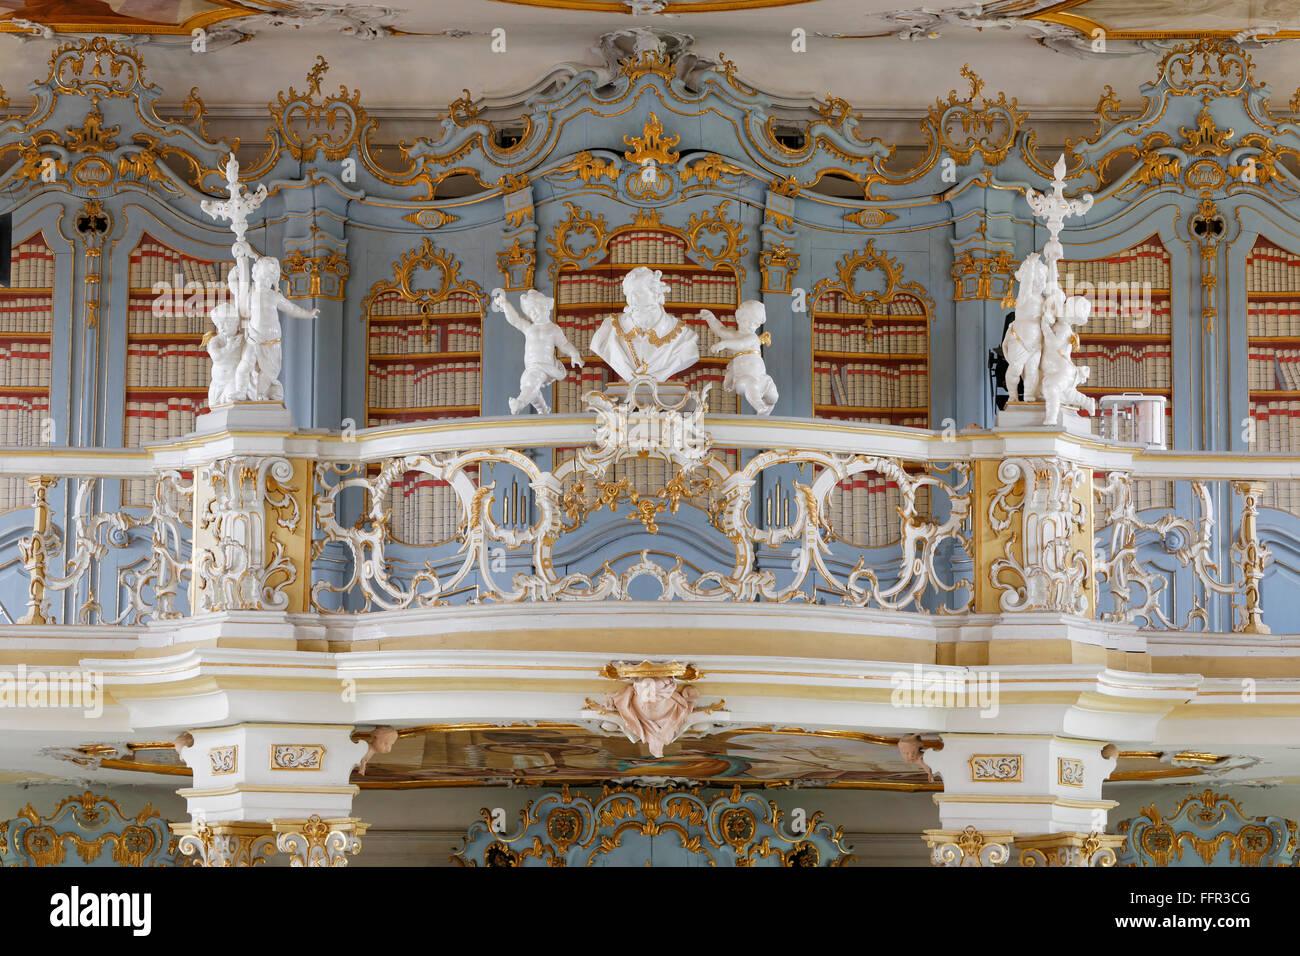 Gallery, Rococo library, Schussenried Abbey, Bad Schussenried, Upper Swabia, Swabia, Baden-Württemberg, Germany - Stock Image